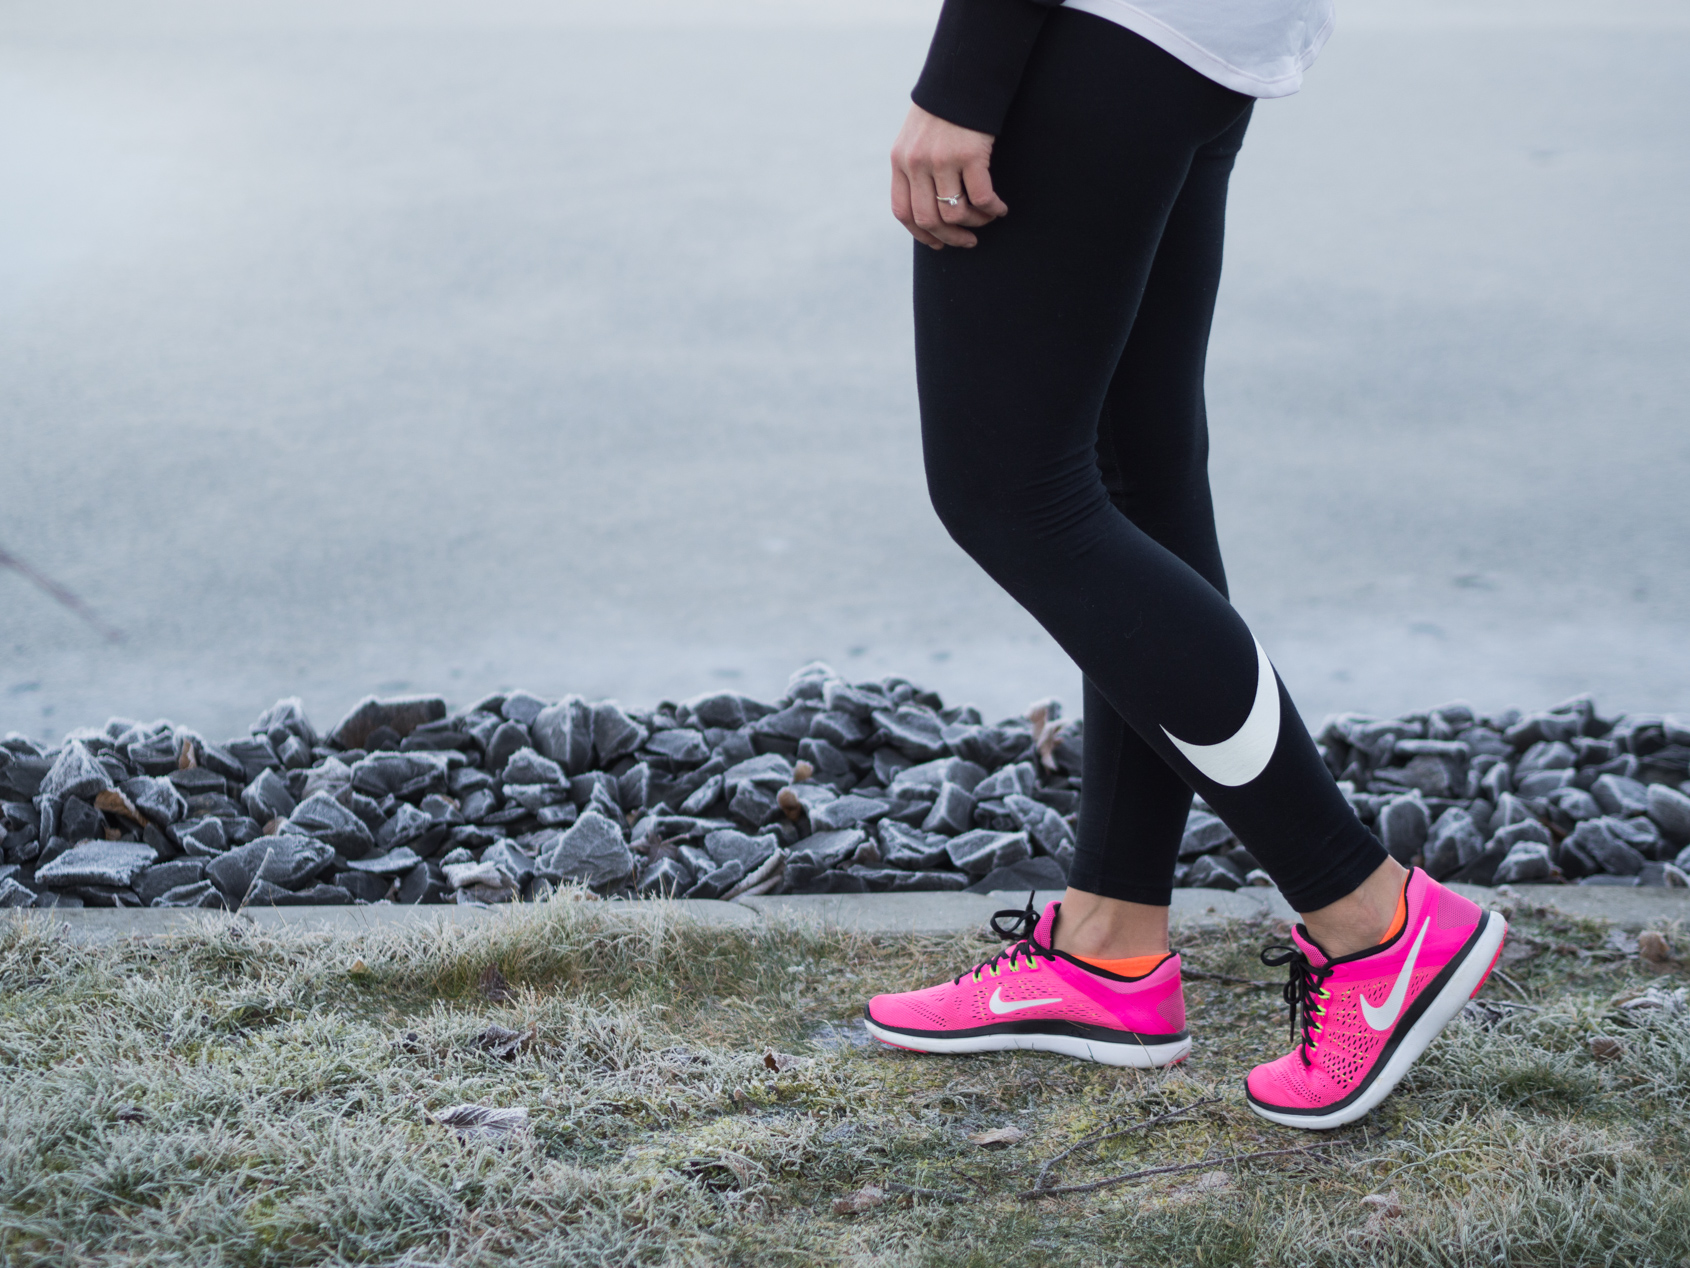 Fitnessesplan, Workout, Fit ins neue Jahr, Workout, Lifestyle, Fitnessblog